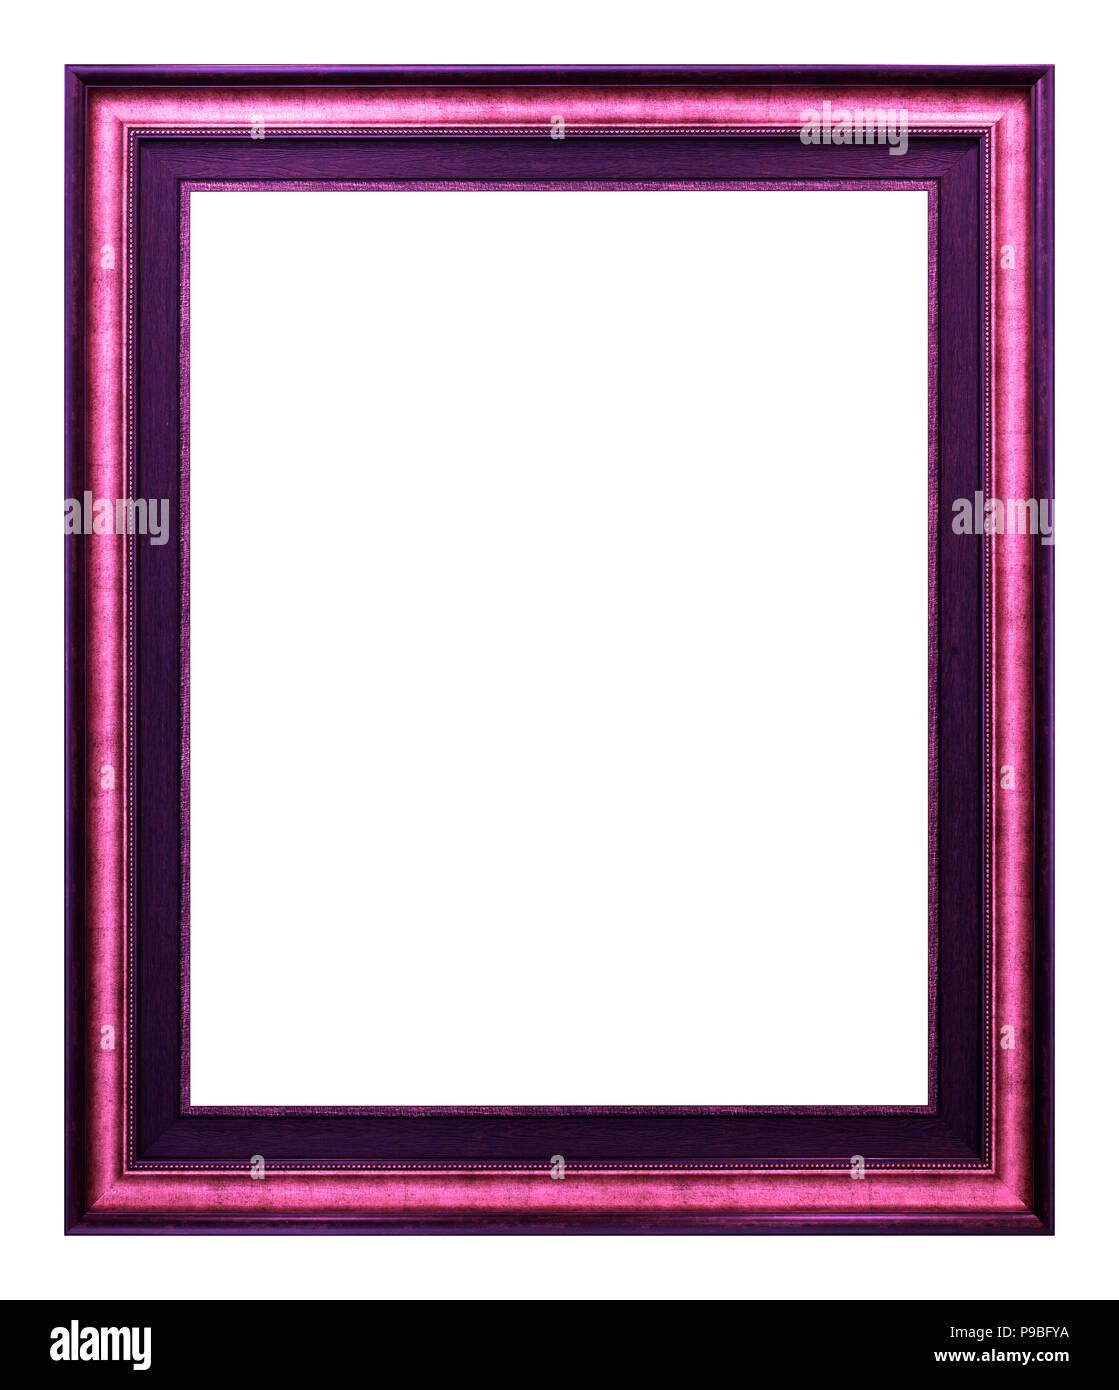 Antique magenta frame isolated on the white background vintage style - Stock Image